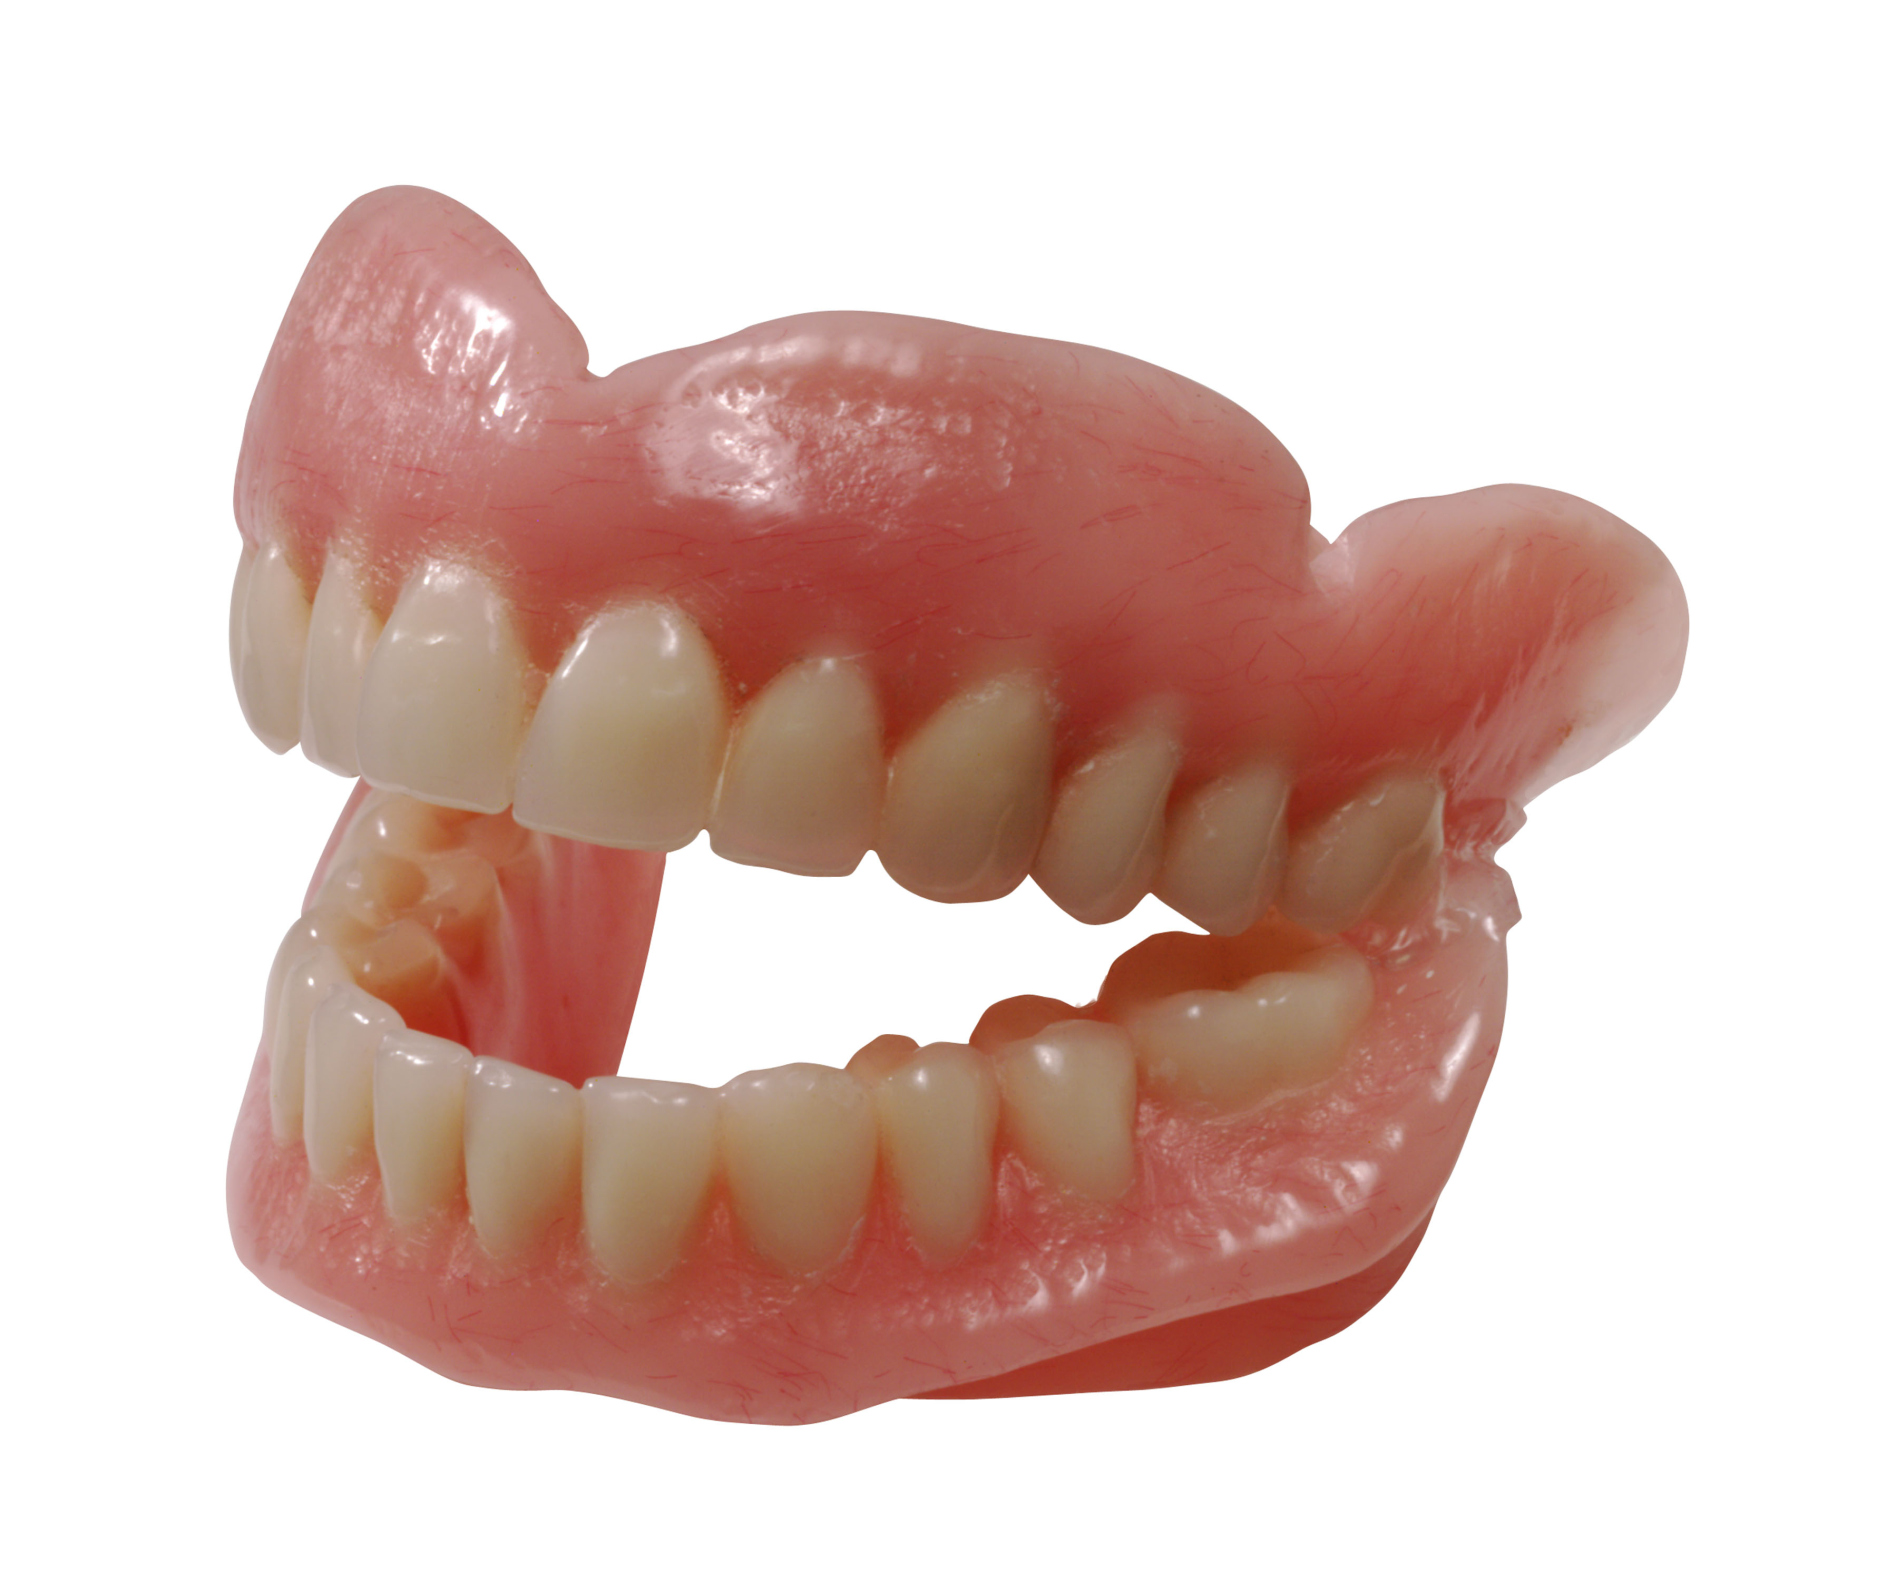 Recipe for Homemade Denture Adhesive